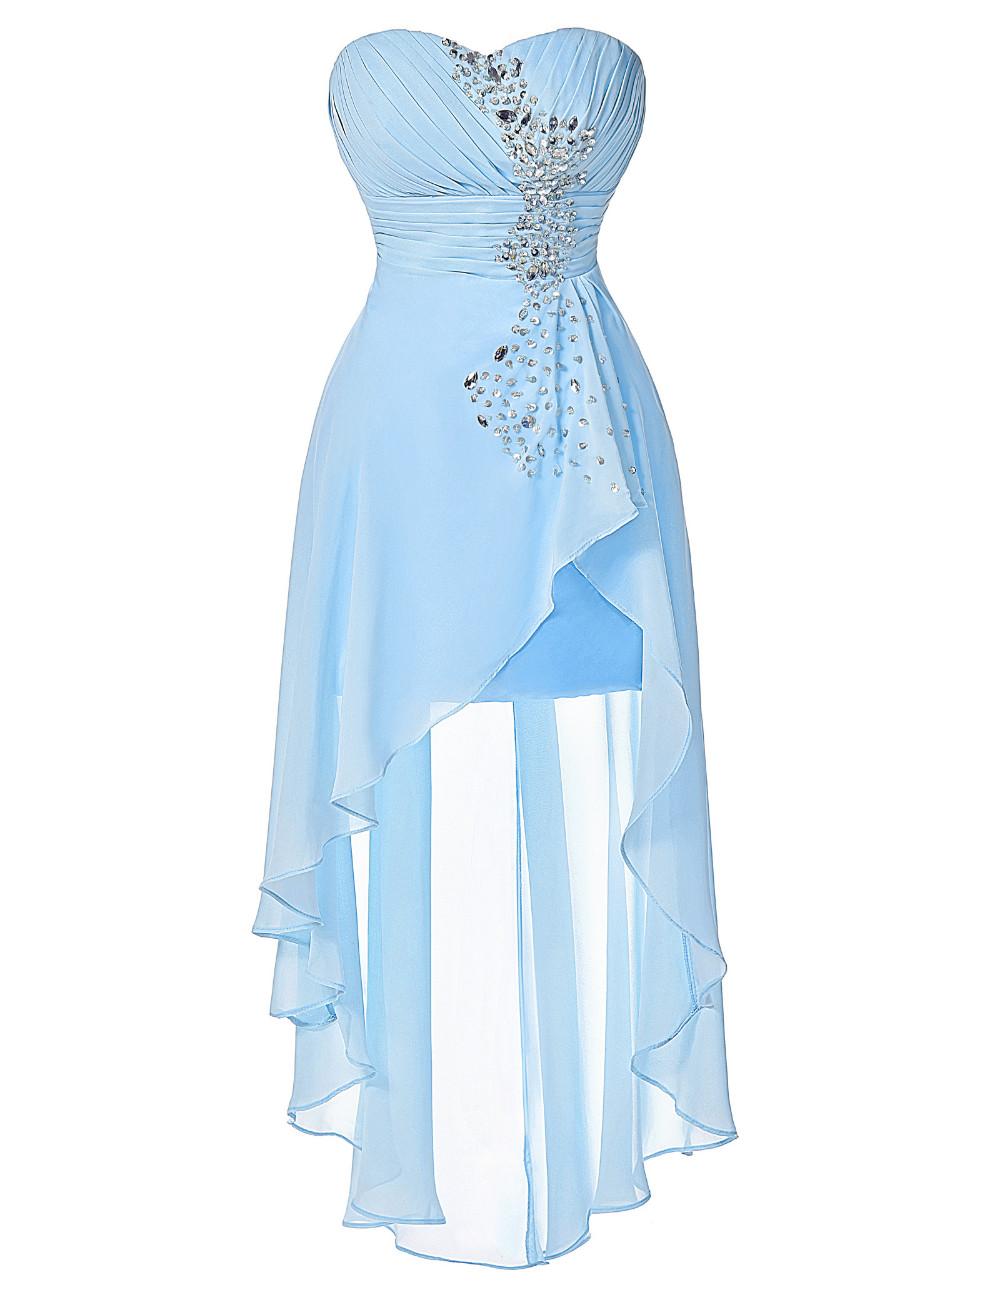 HTB1So3aKVXXXXXfXpXXq6xXFXXXpHigh Low Short Front Long Back Strapless Dress